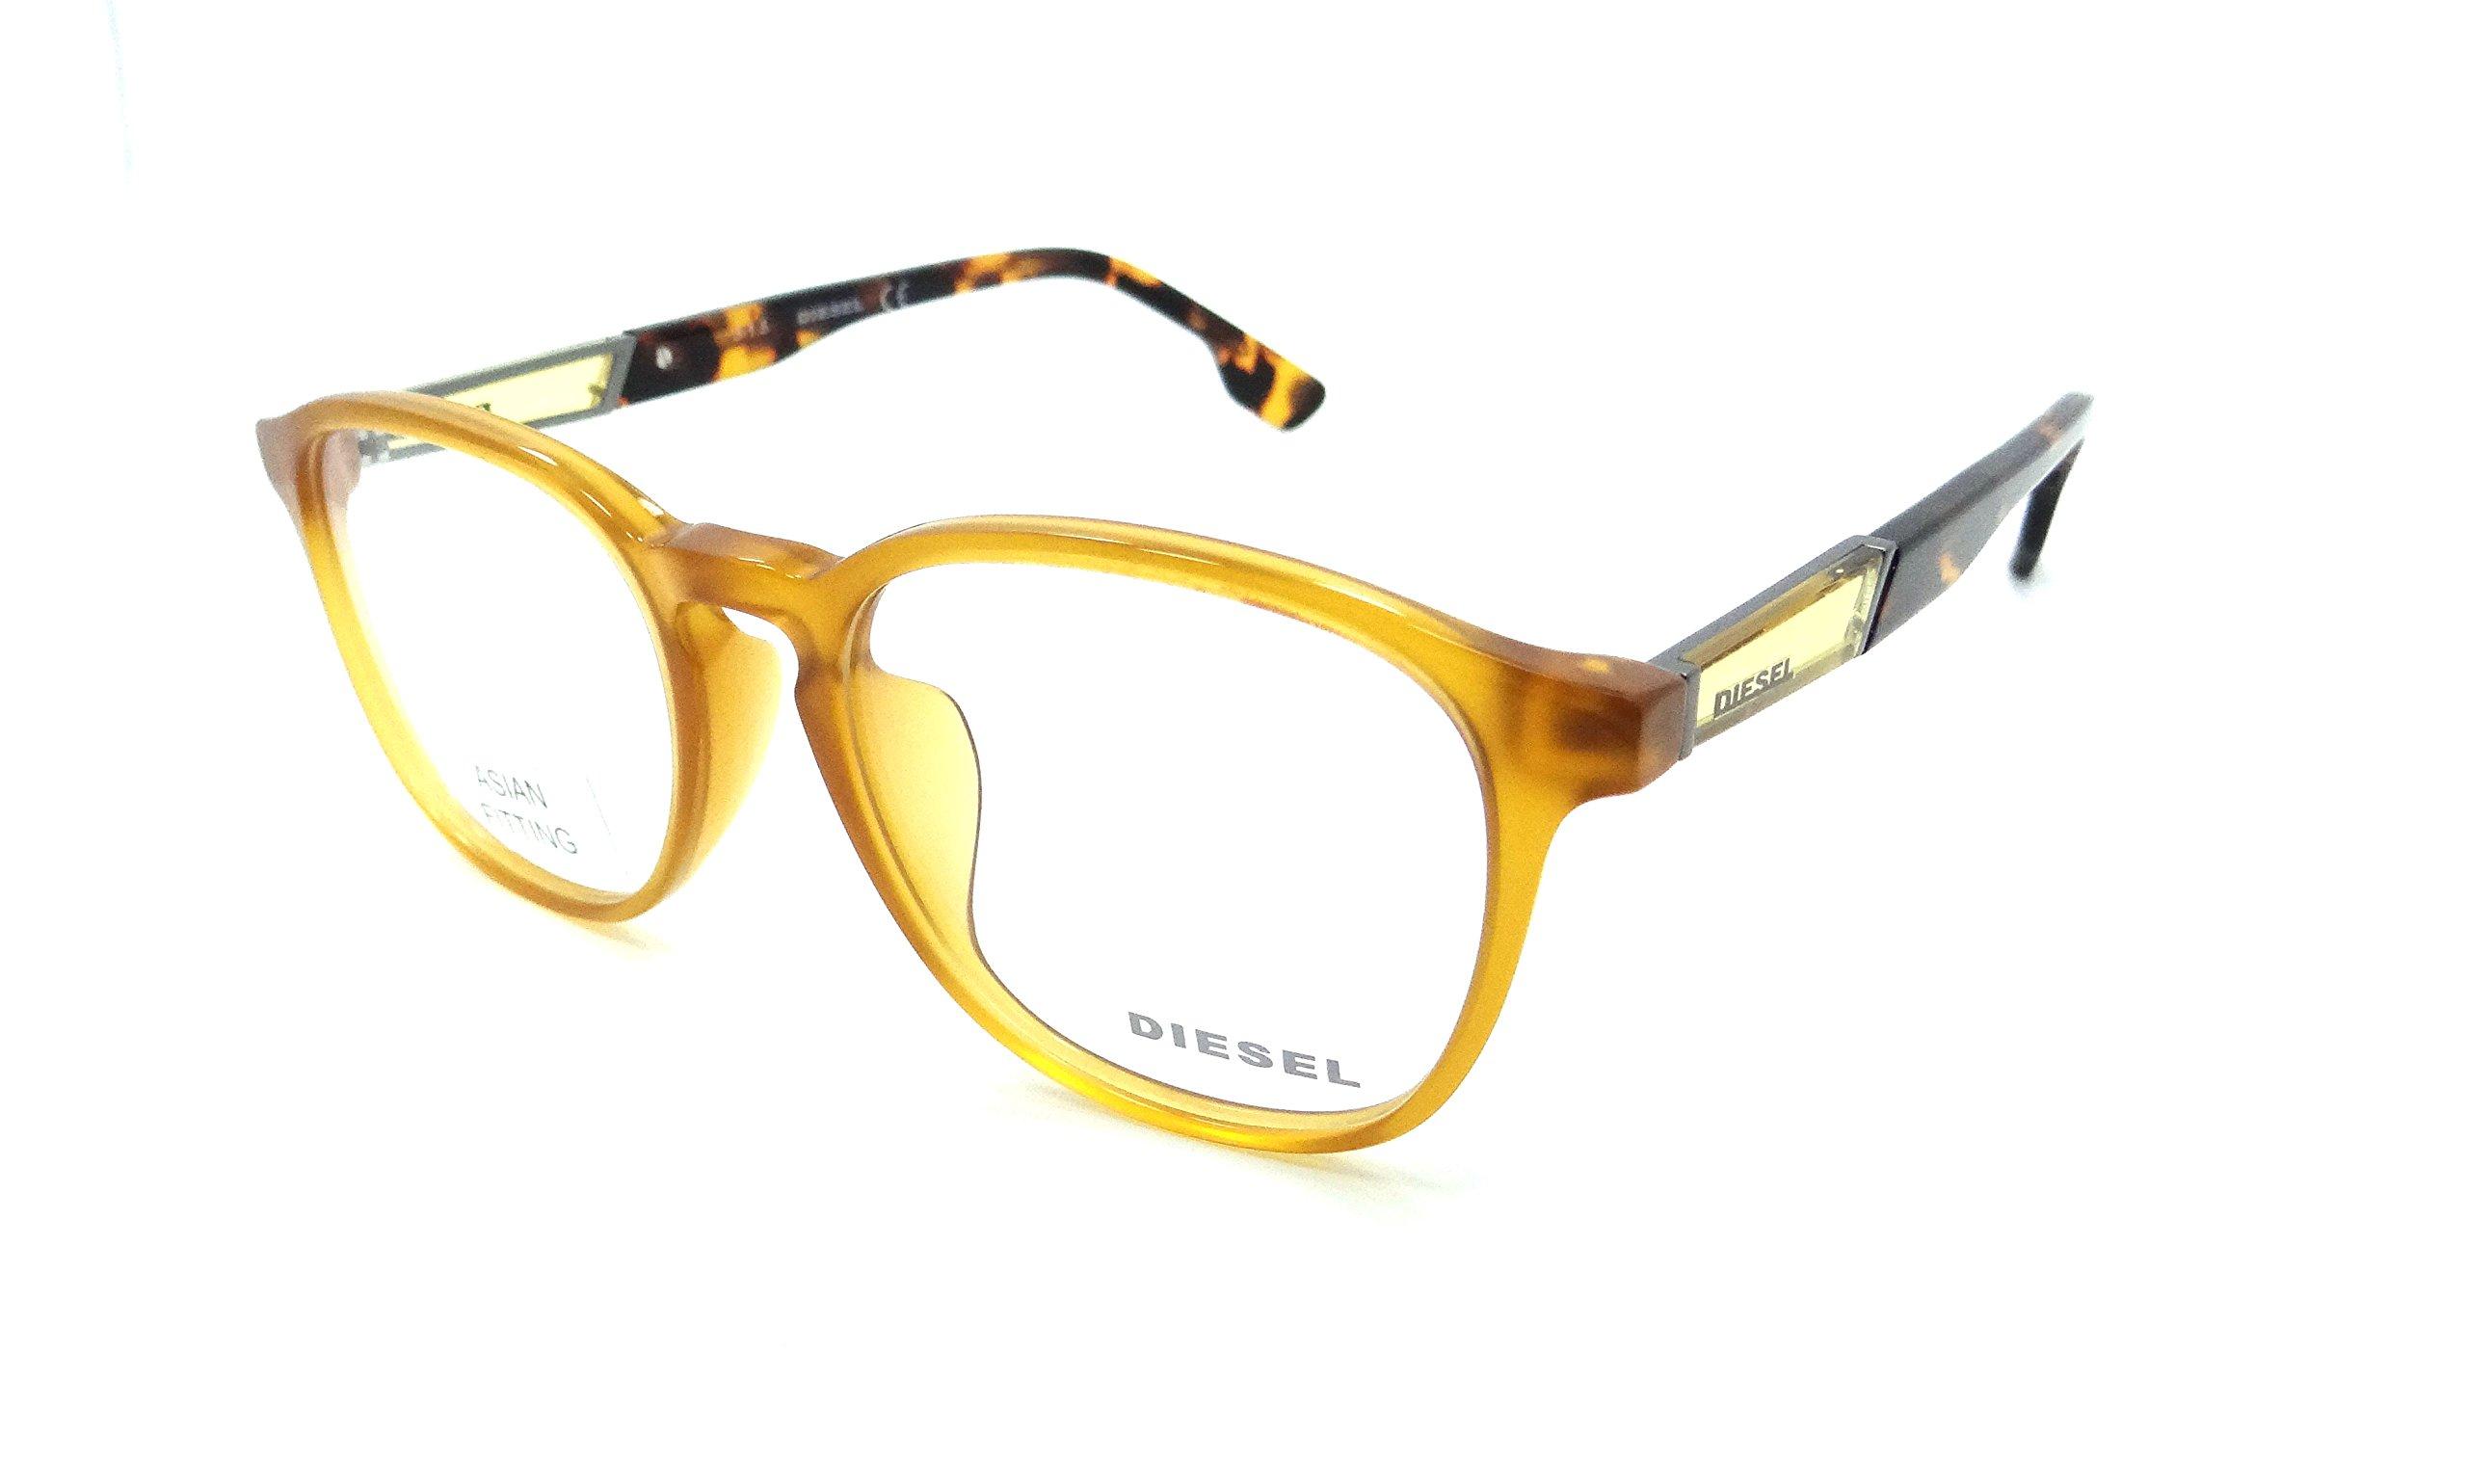 Diesel Rx Eyeglasses Frames DL5123-F 040 52-18-150 Yellow / Havana Asian Fit